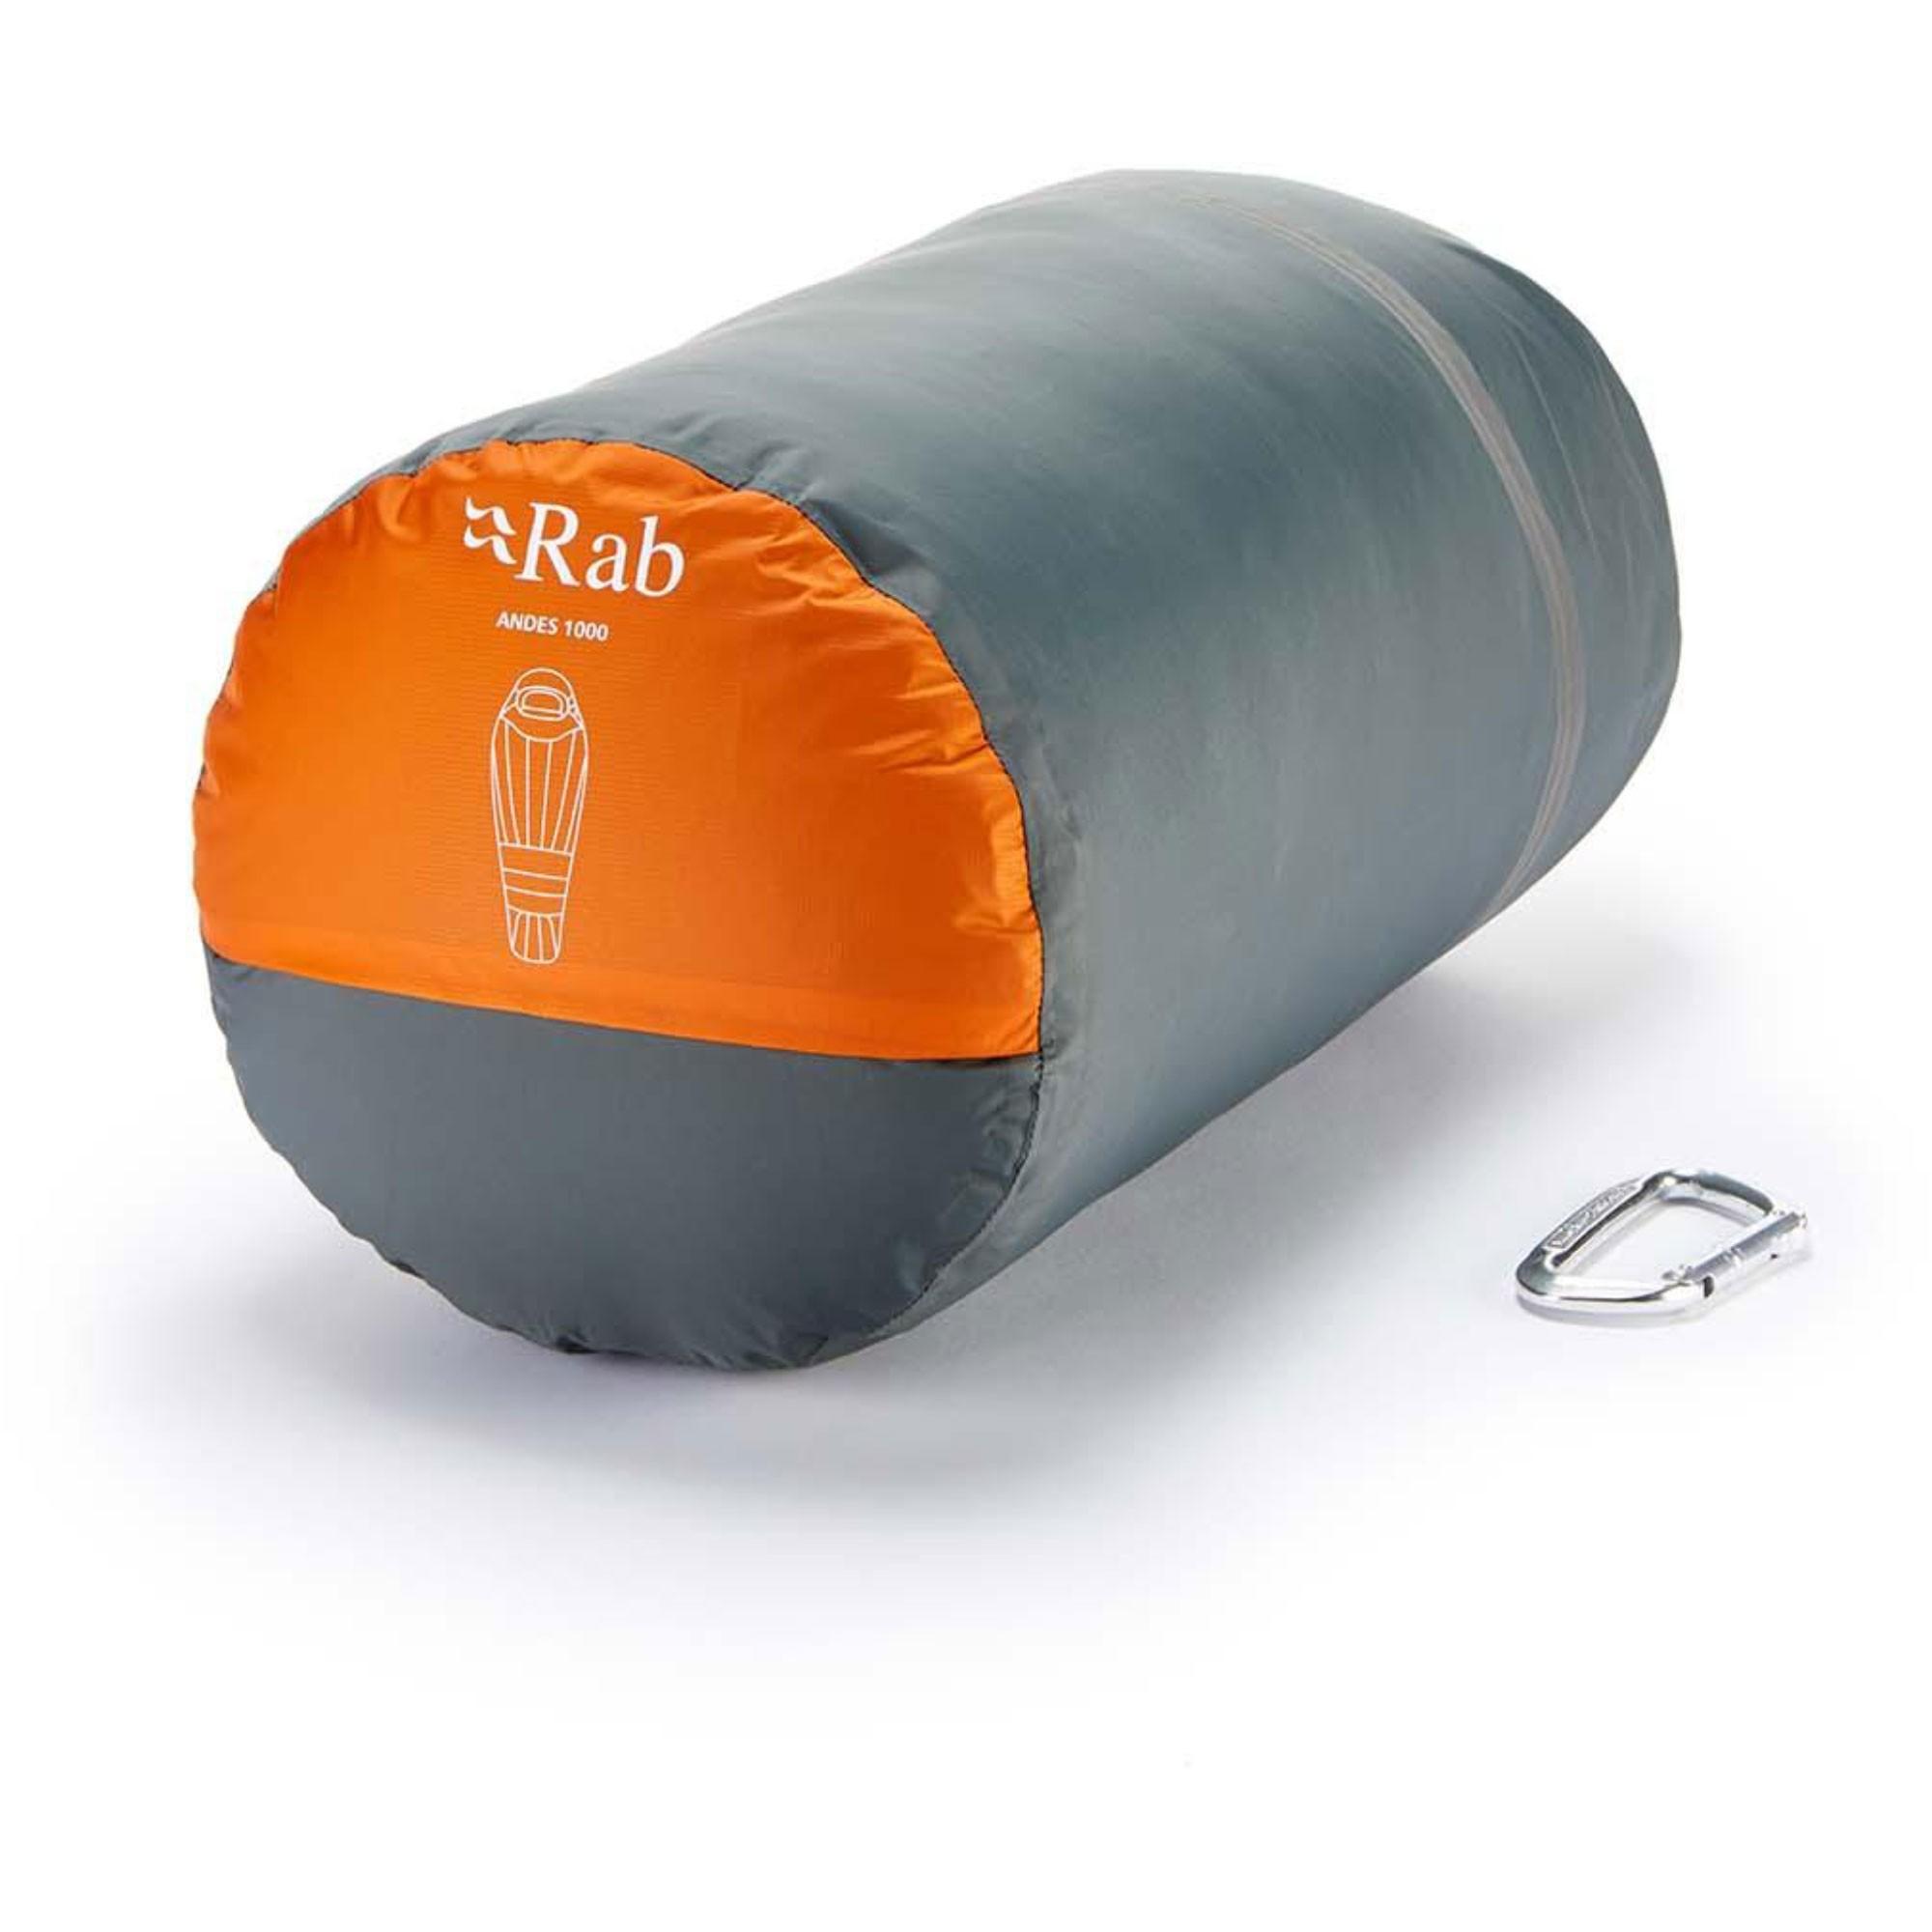 Rab Andes1000 Down Sleeping Bag Standard Length Left Zip - Satsuma - packed